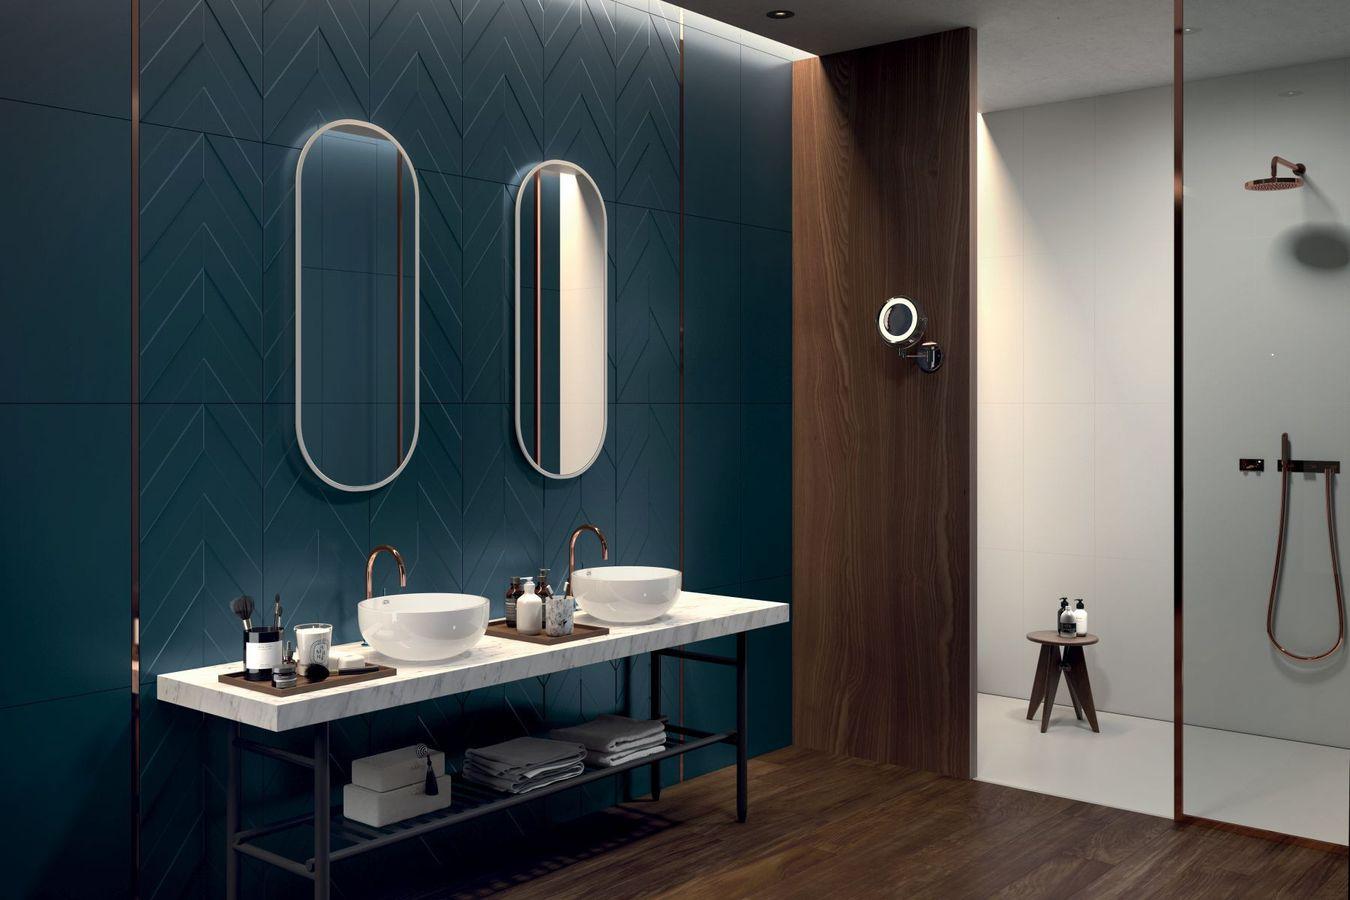 Salle De Bains Espace Public ~ marca corona 4d 17 espace public salle de bain effet effet 3d